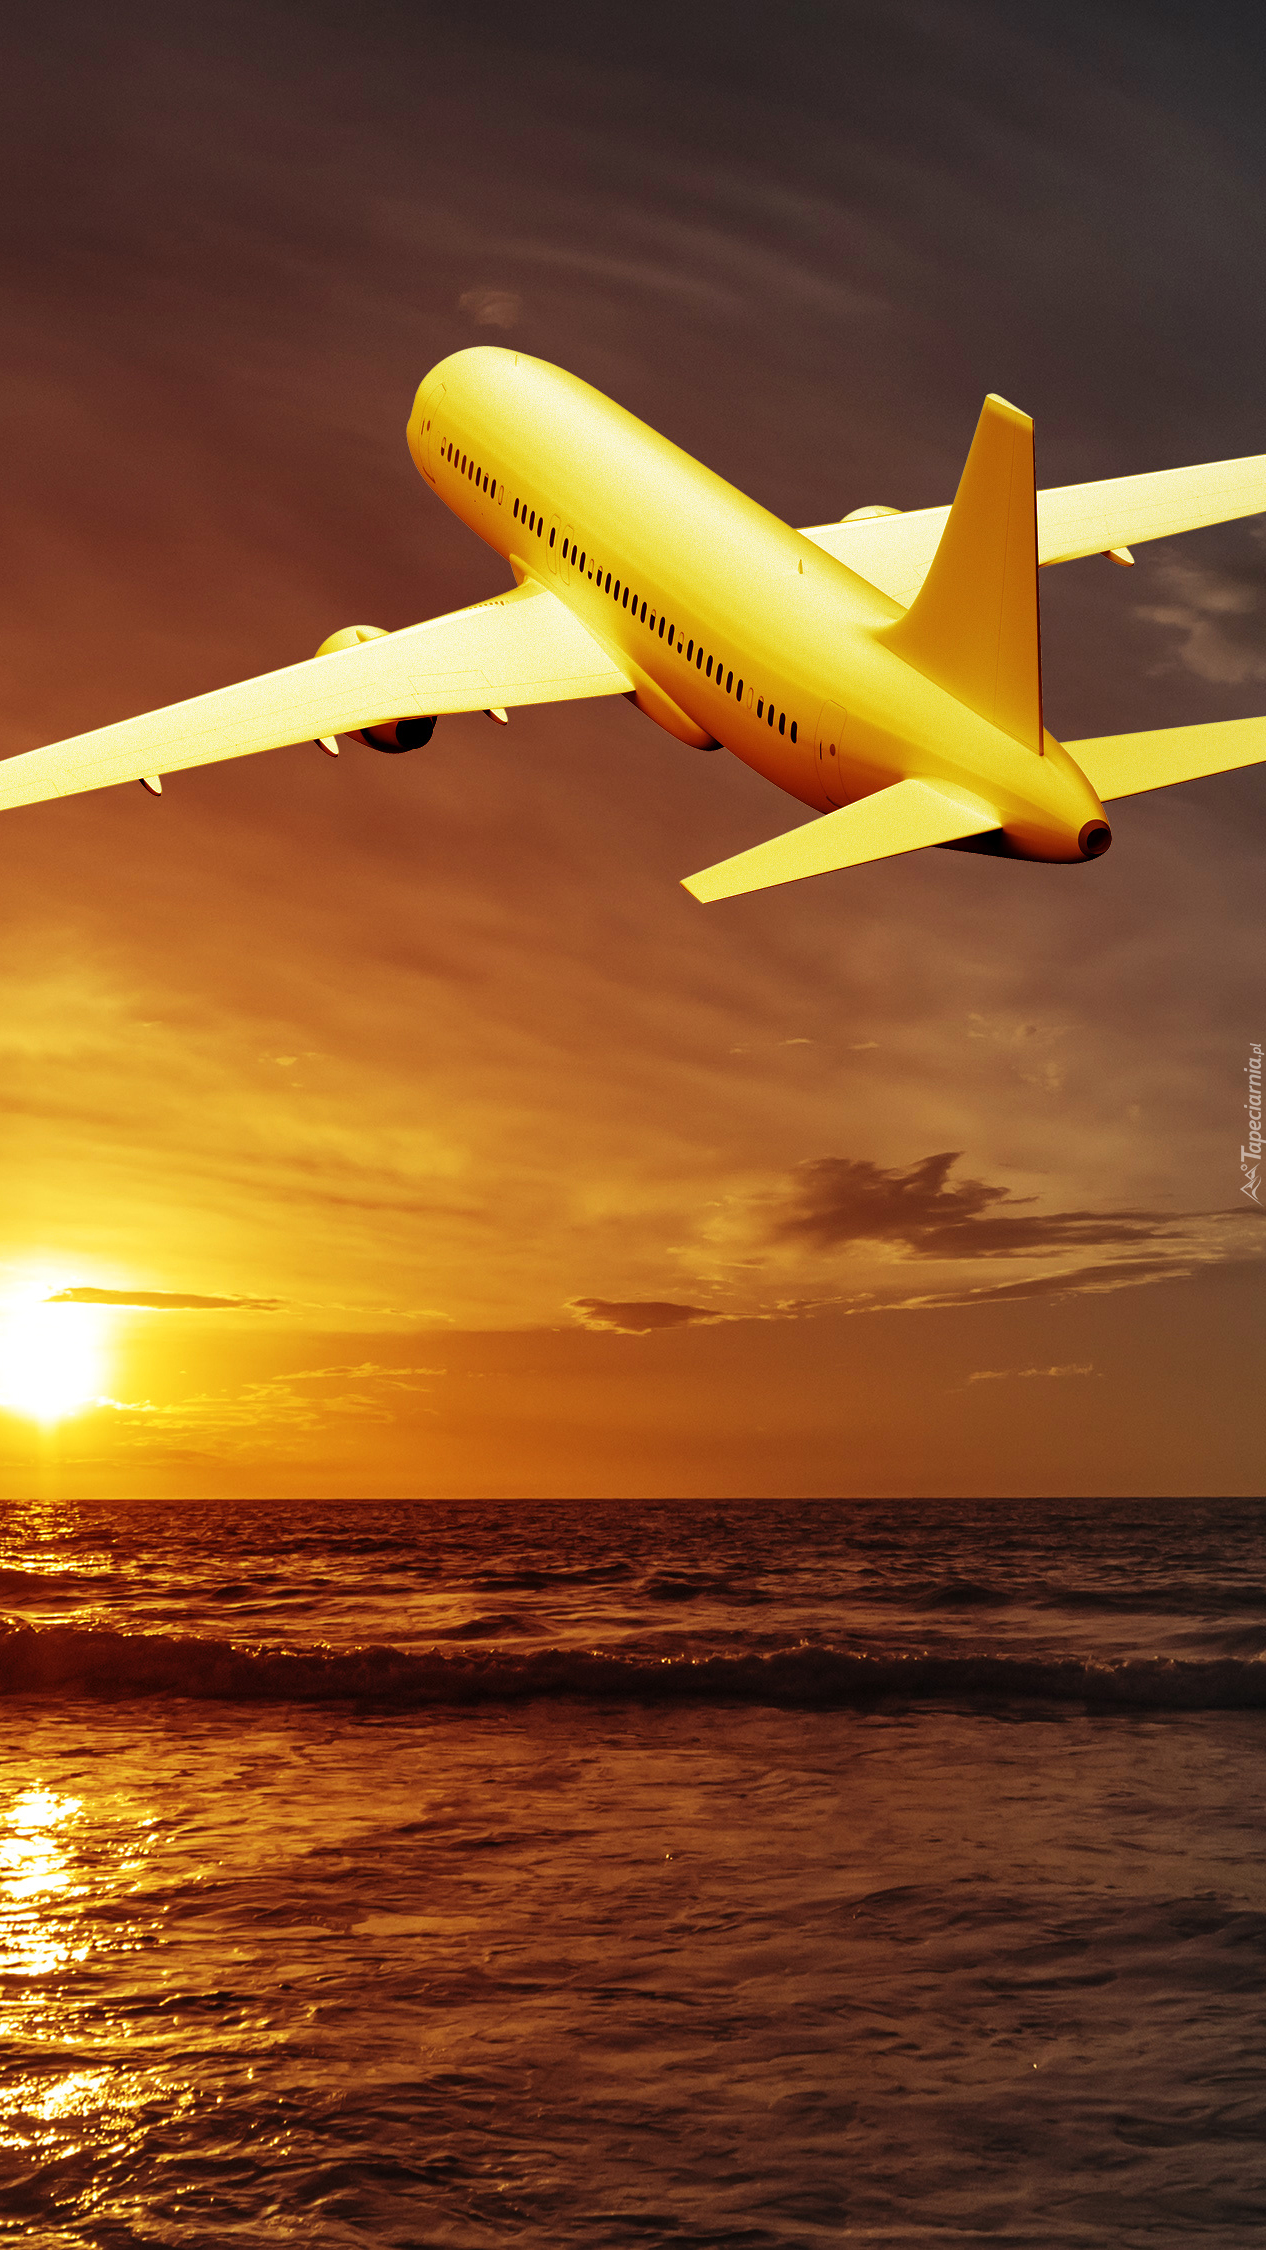 Samolot nad morzem